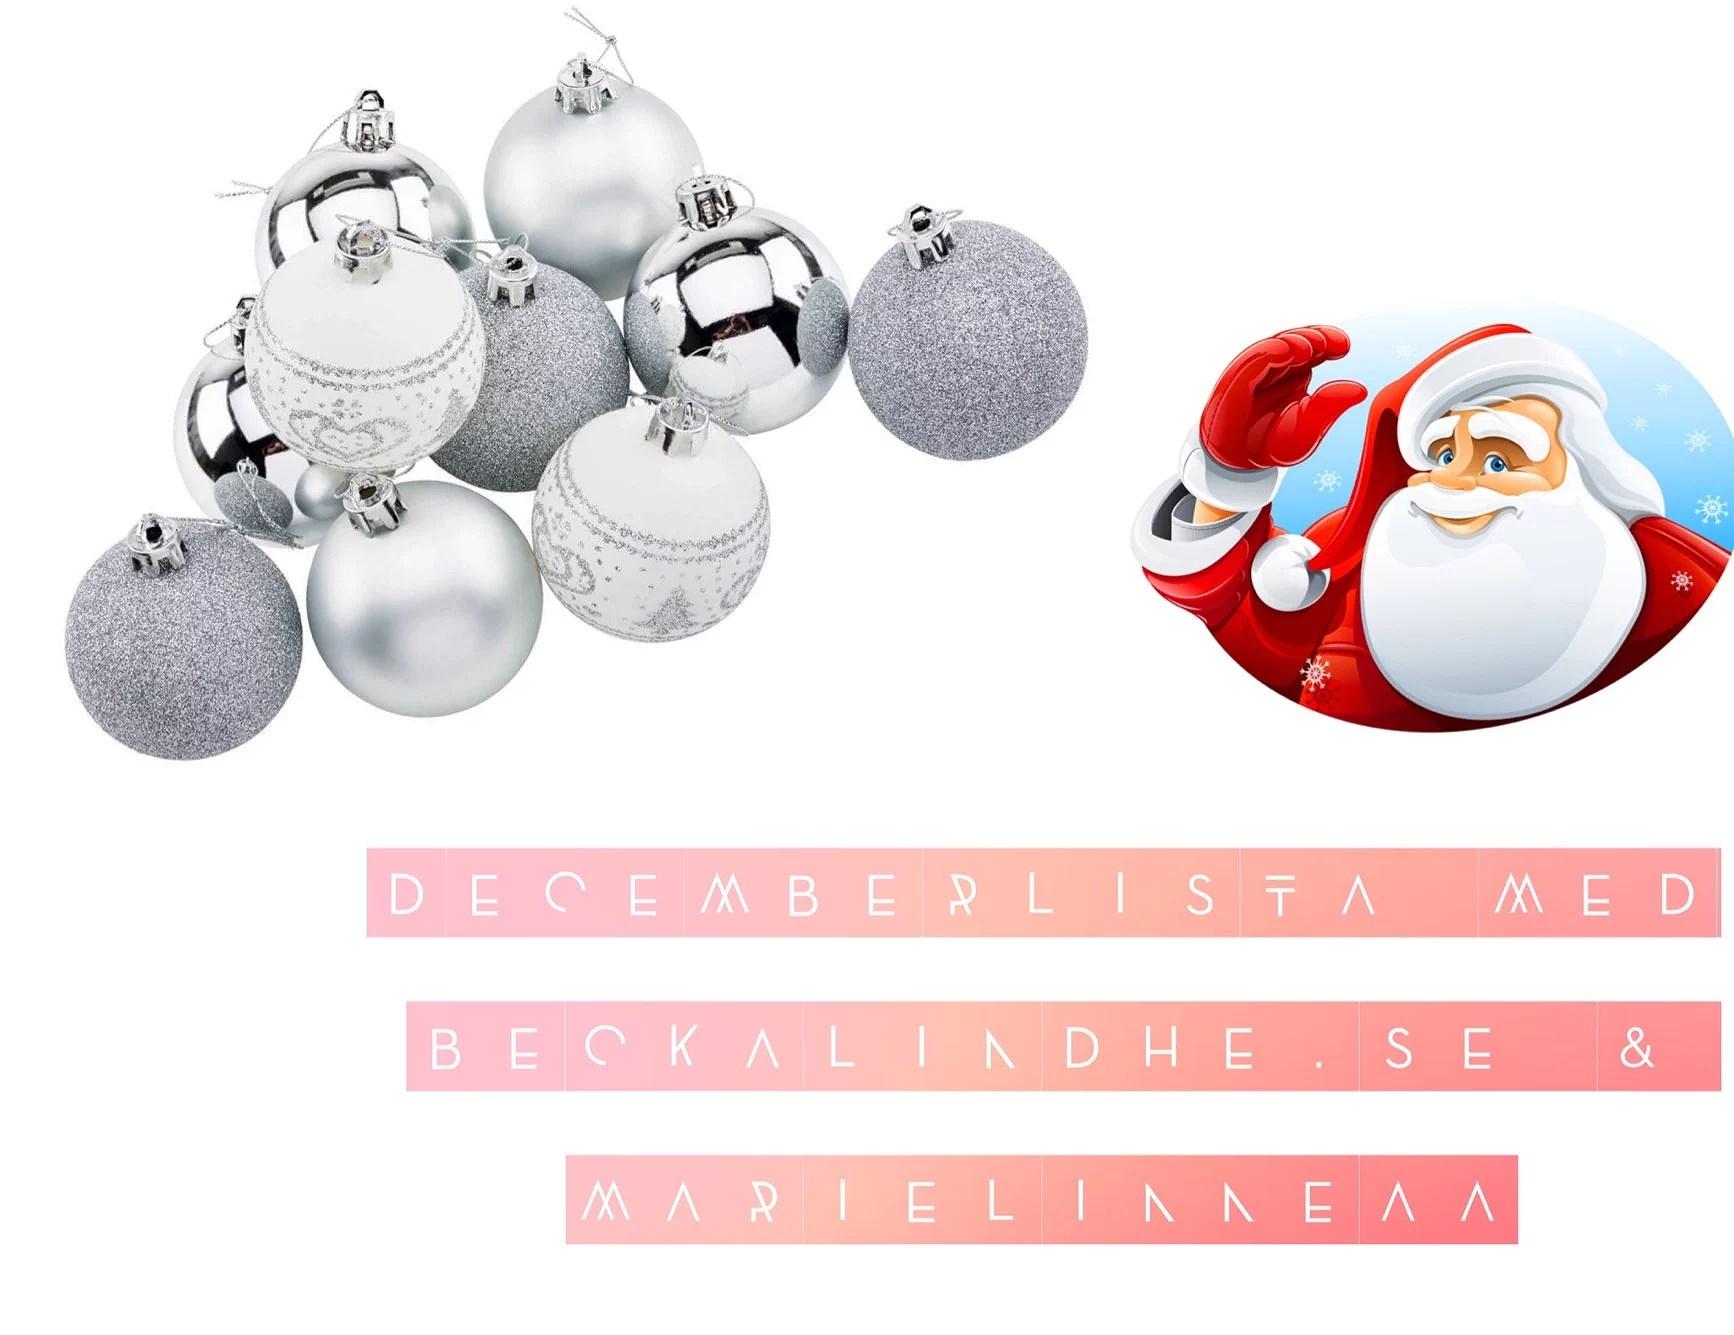 Decemberlista dag 20